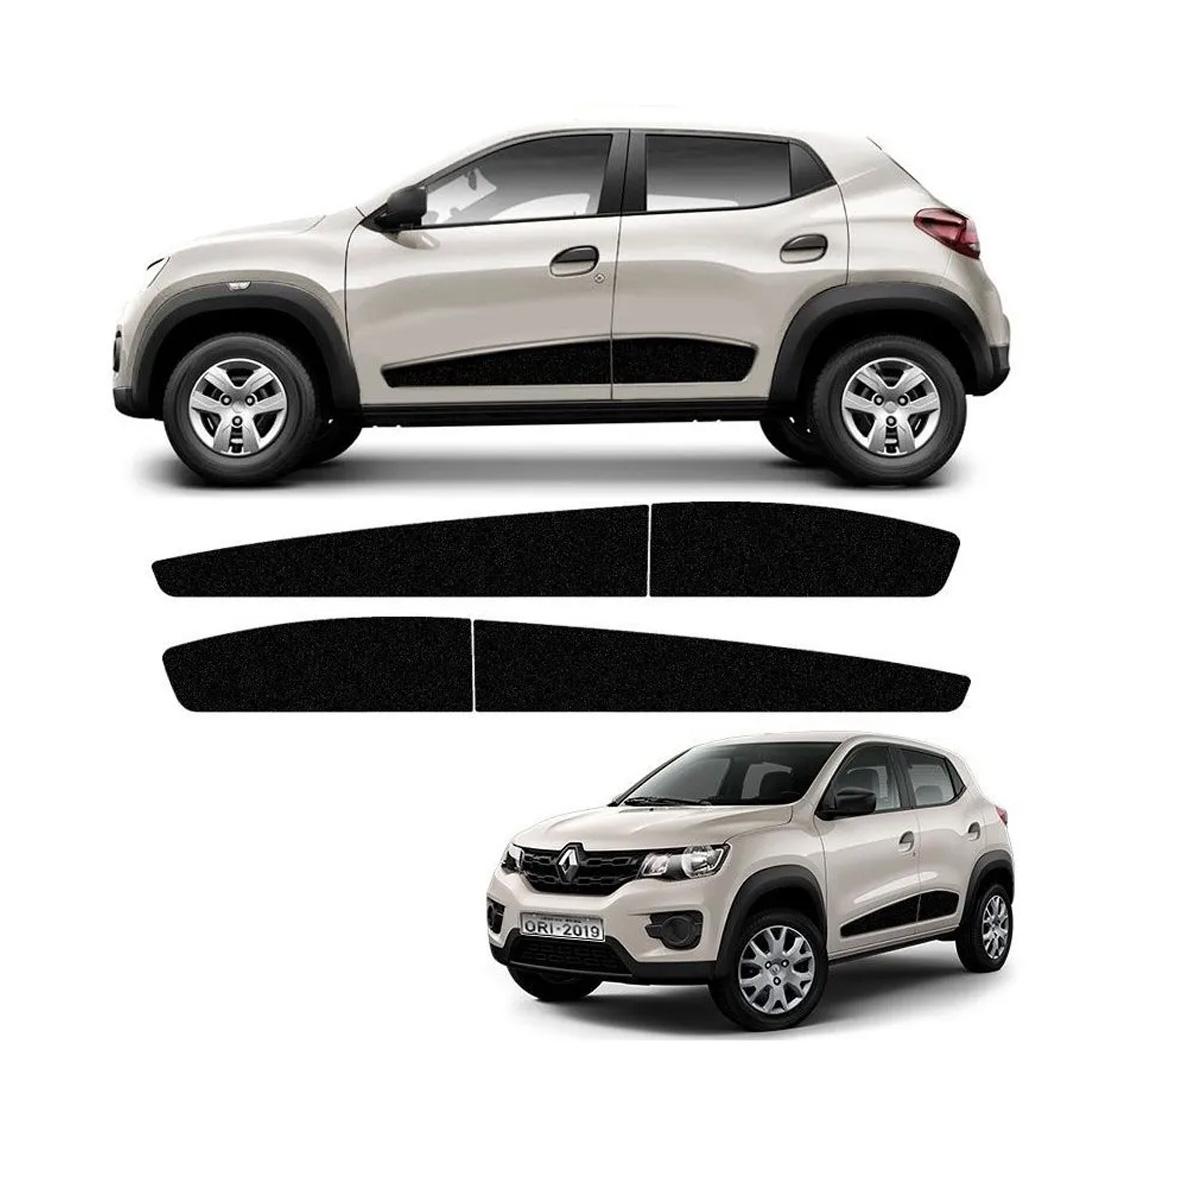 Kit Faixa Lateral Renault Kwid 2018 2019 2020 2021 Adesivo Preto